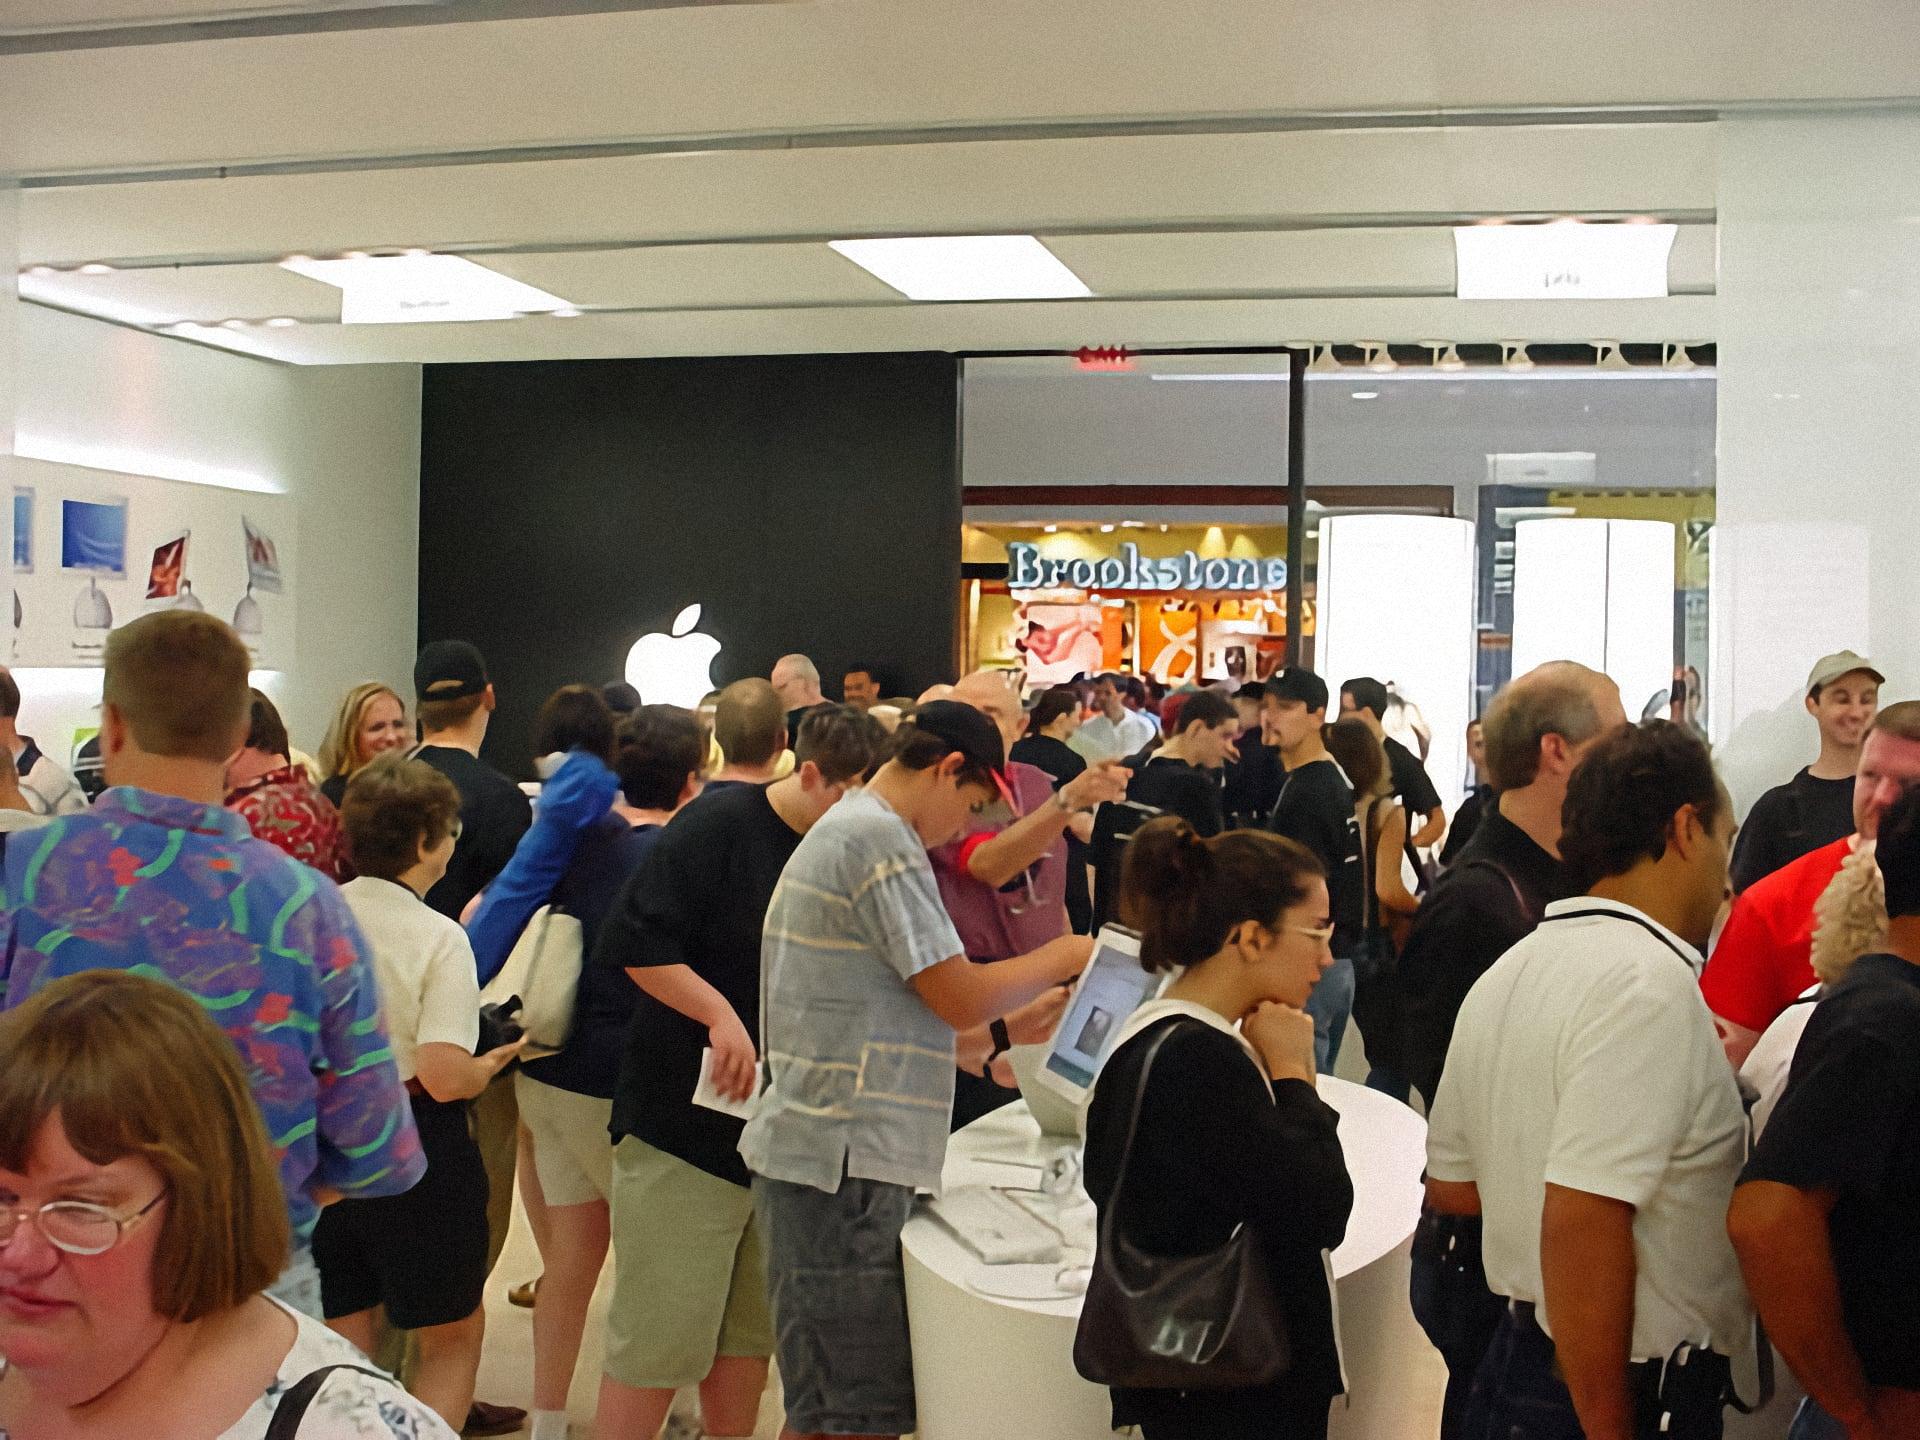 Inside Apple Twelve Oaks on grand opening day.